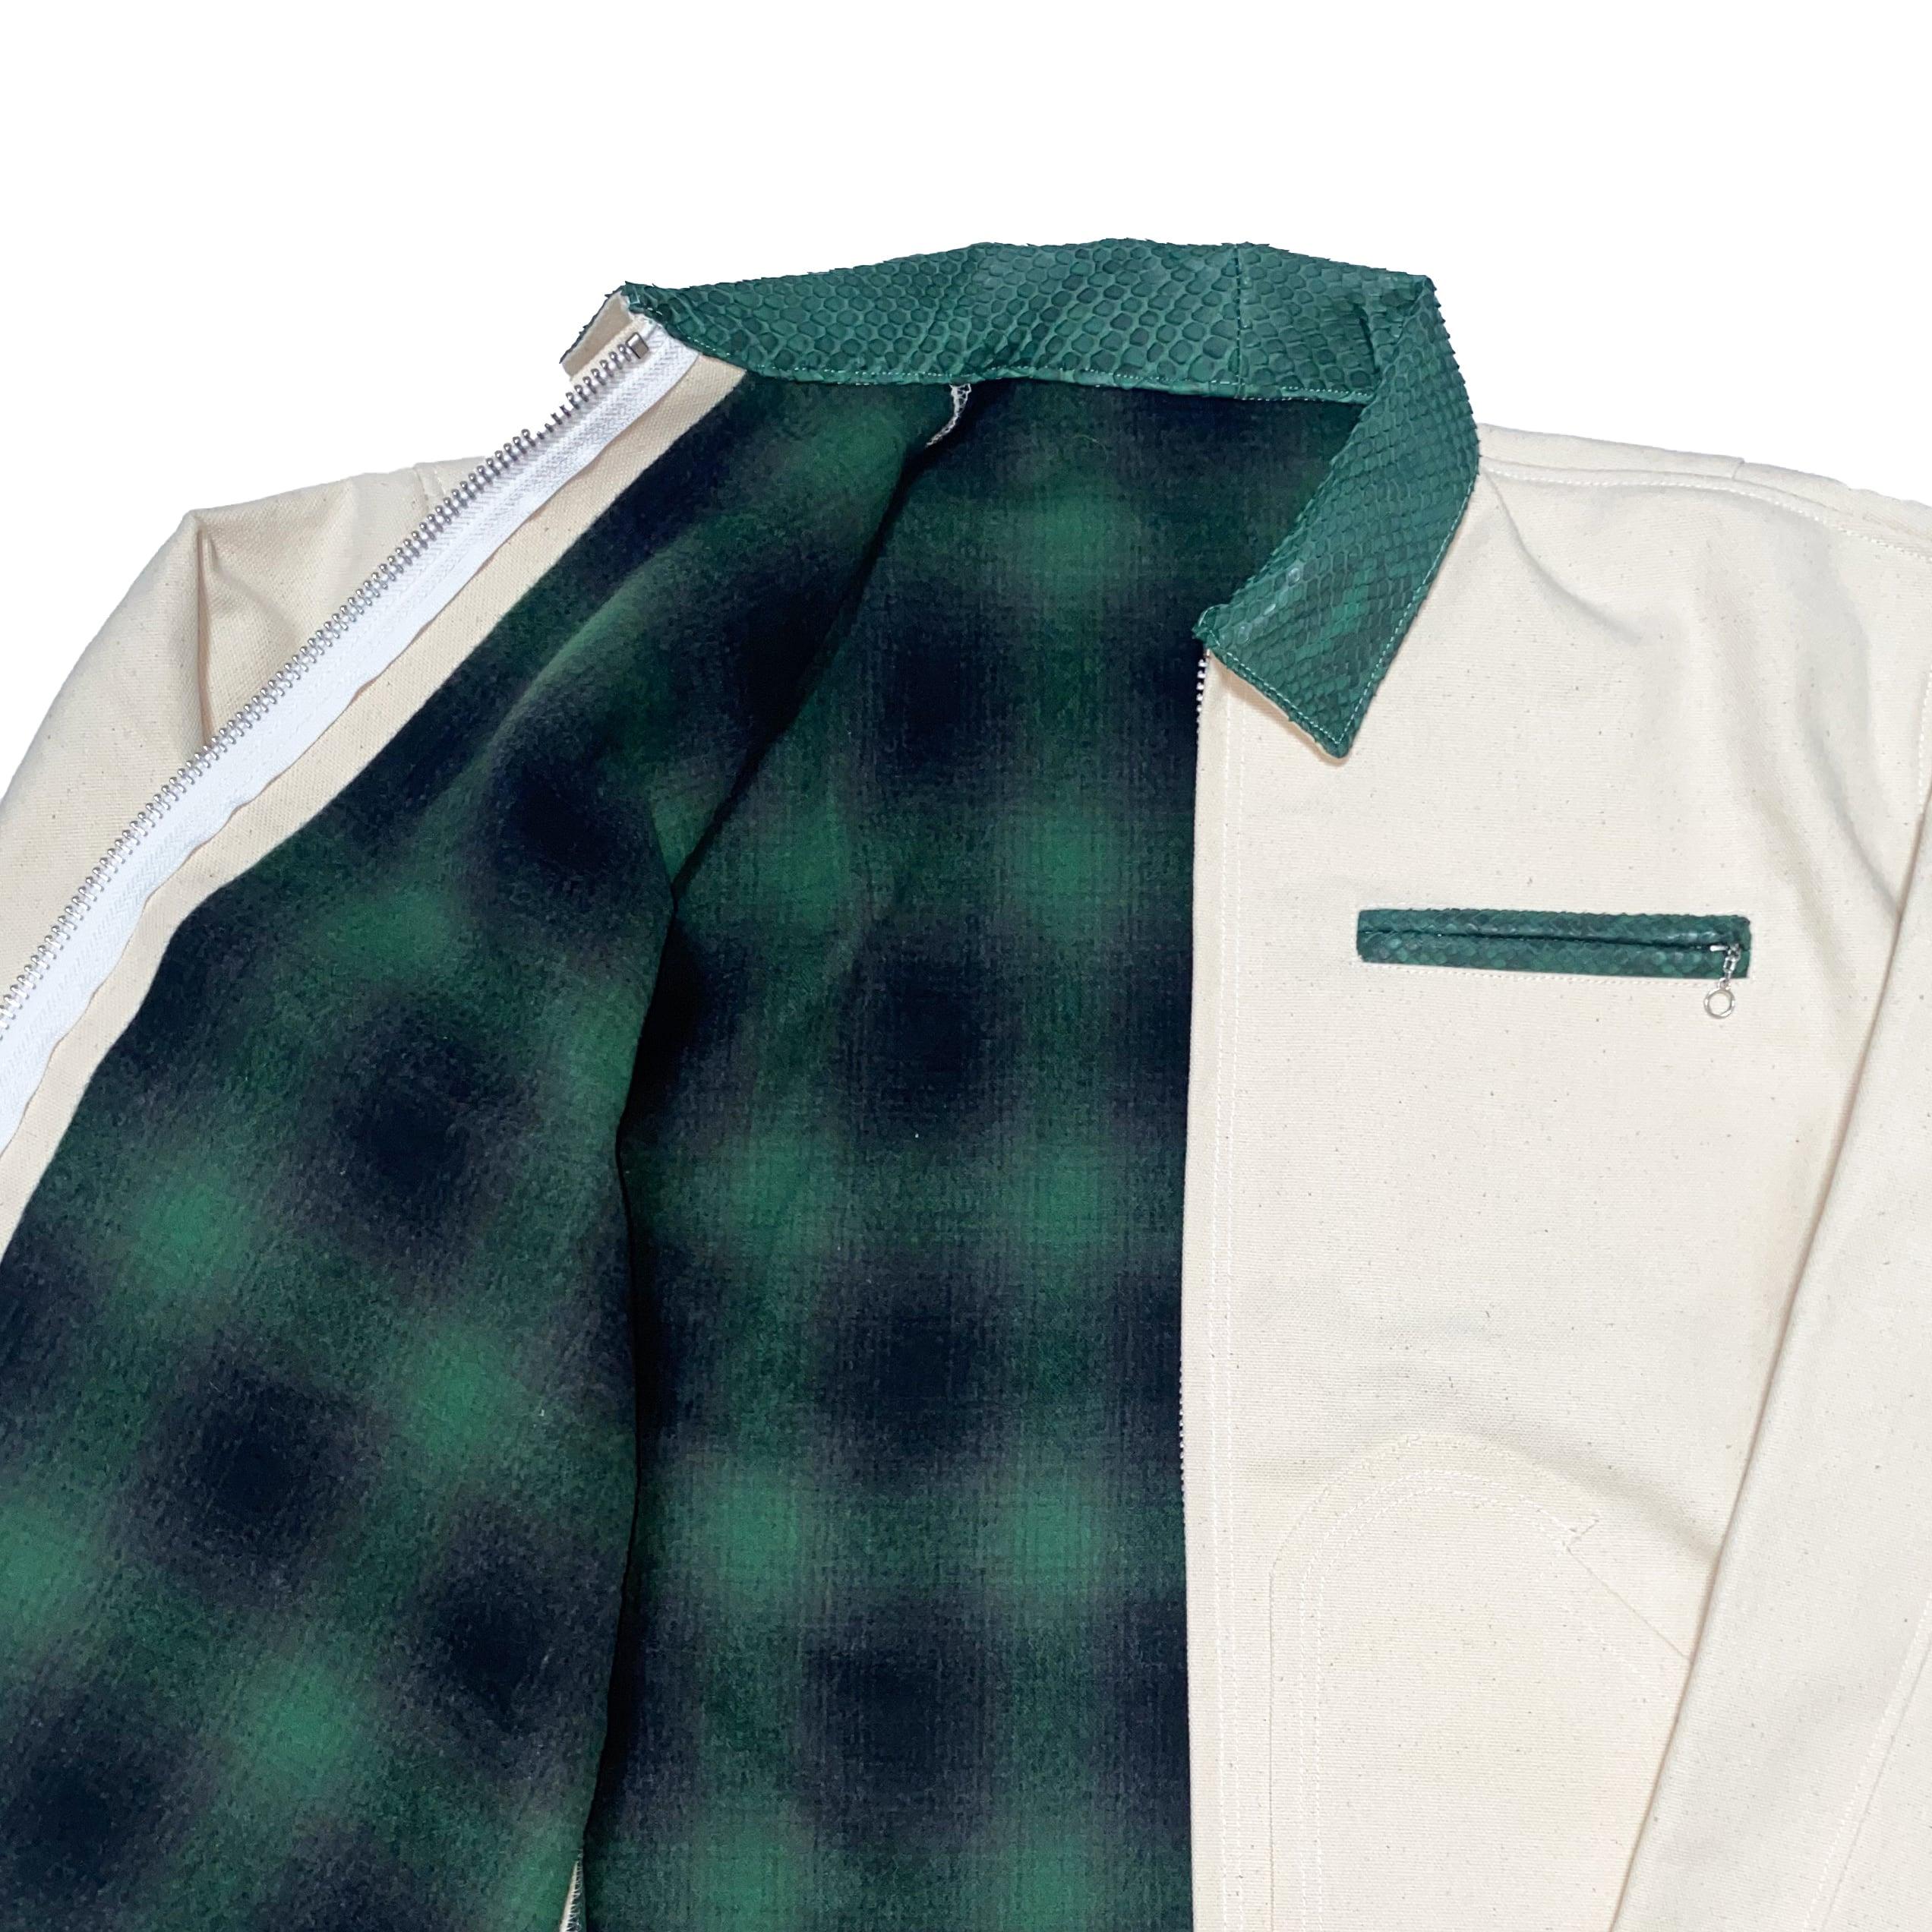 Petroit Work Jacket / White - 画像4